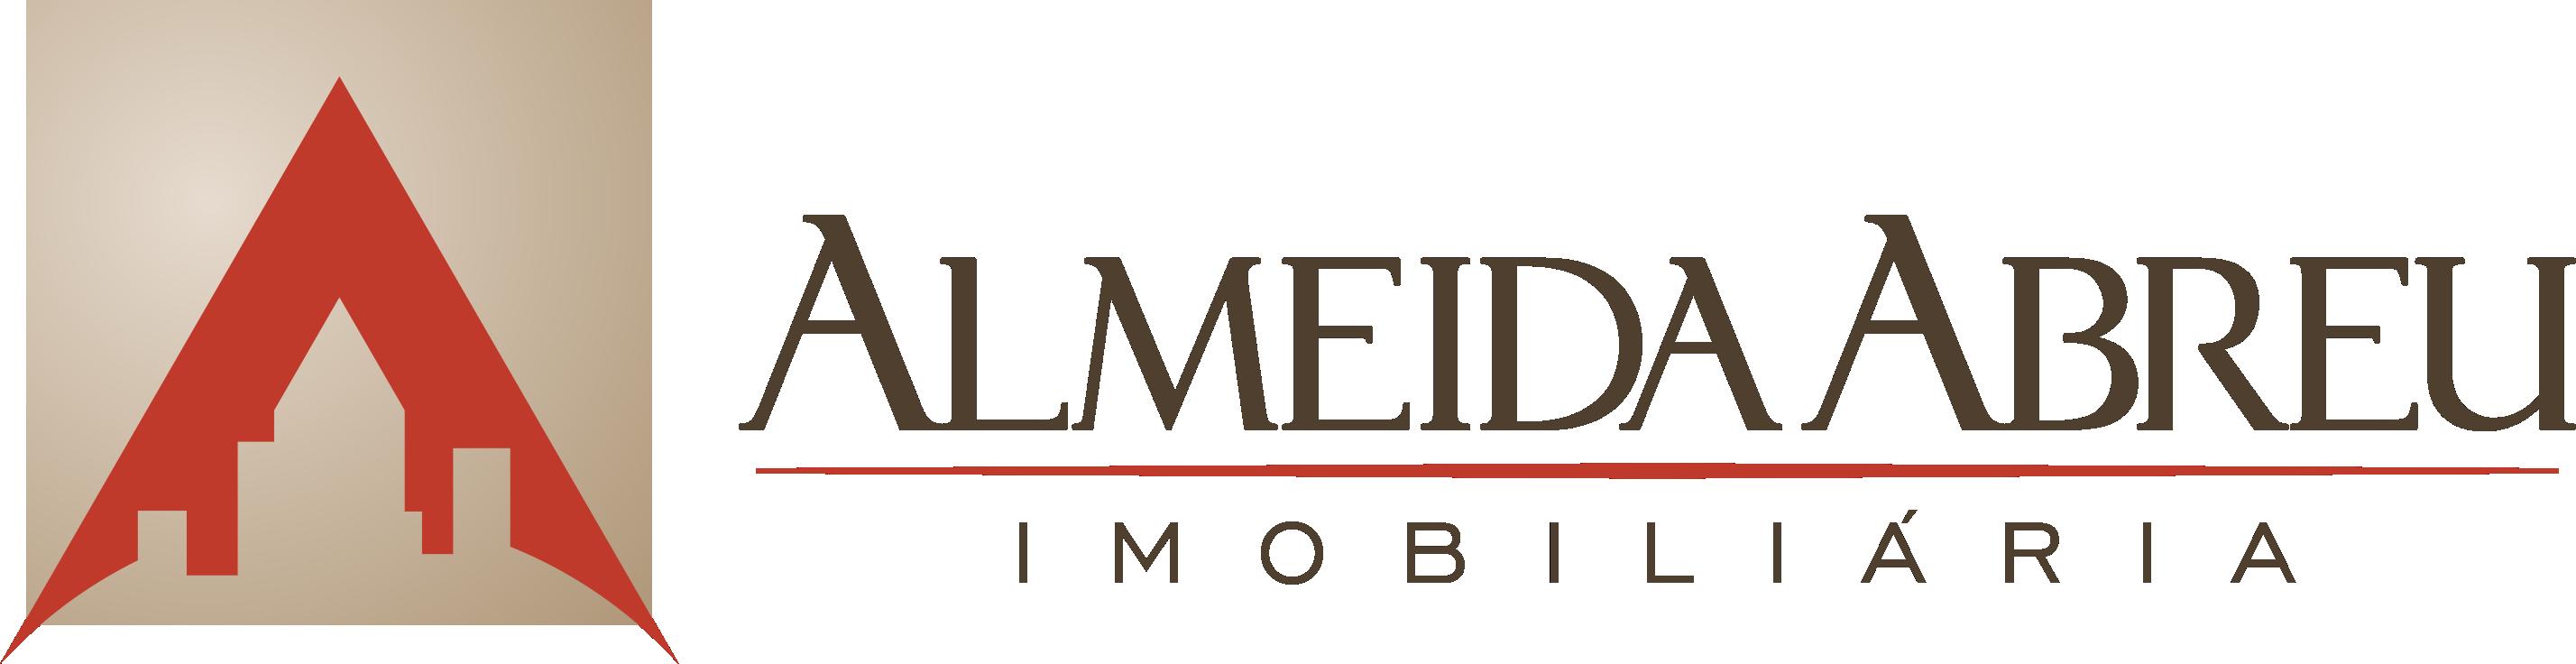 Almeida Abreu Imóbiliaria